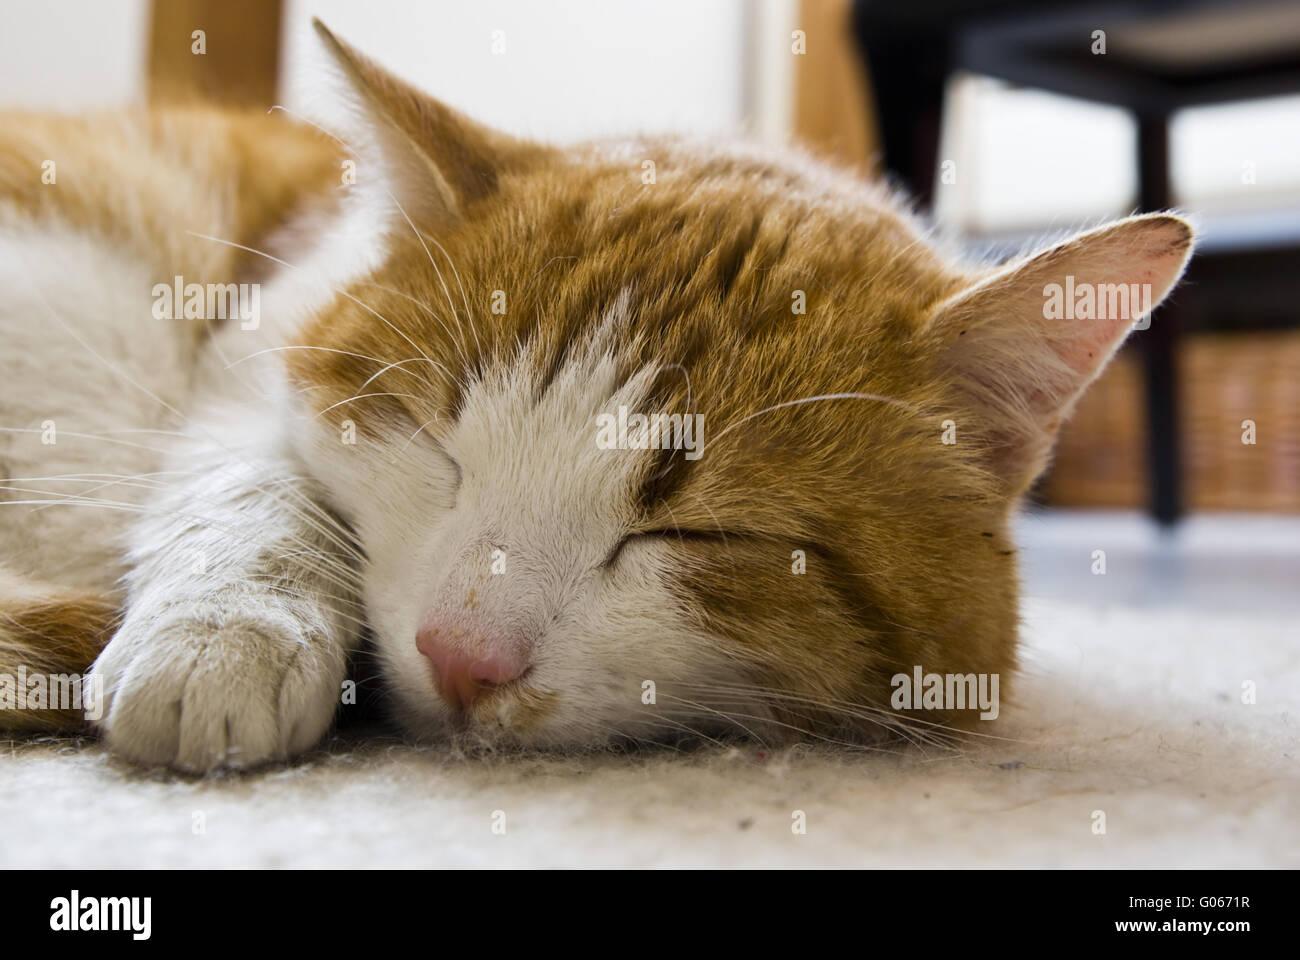 Sleeping house cat Stock Photo